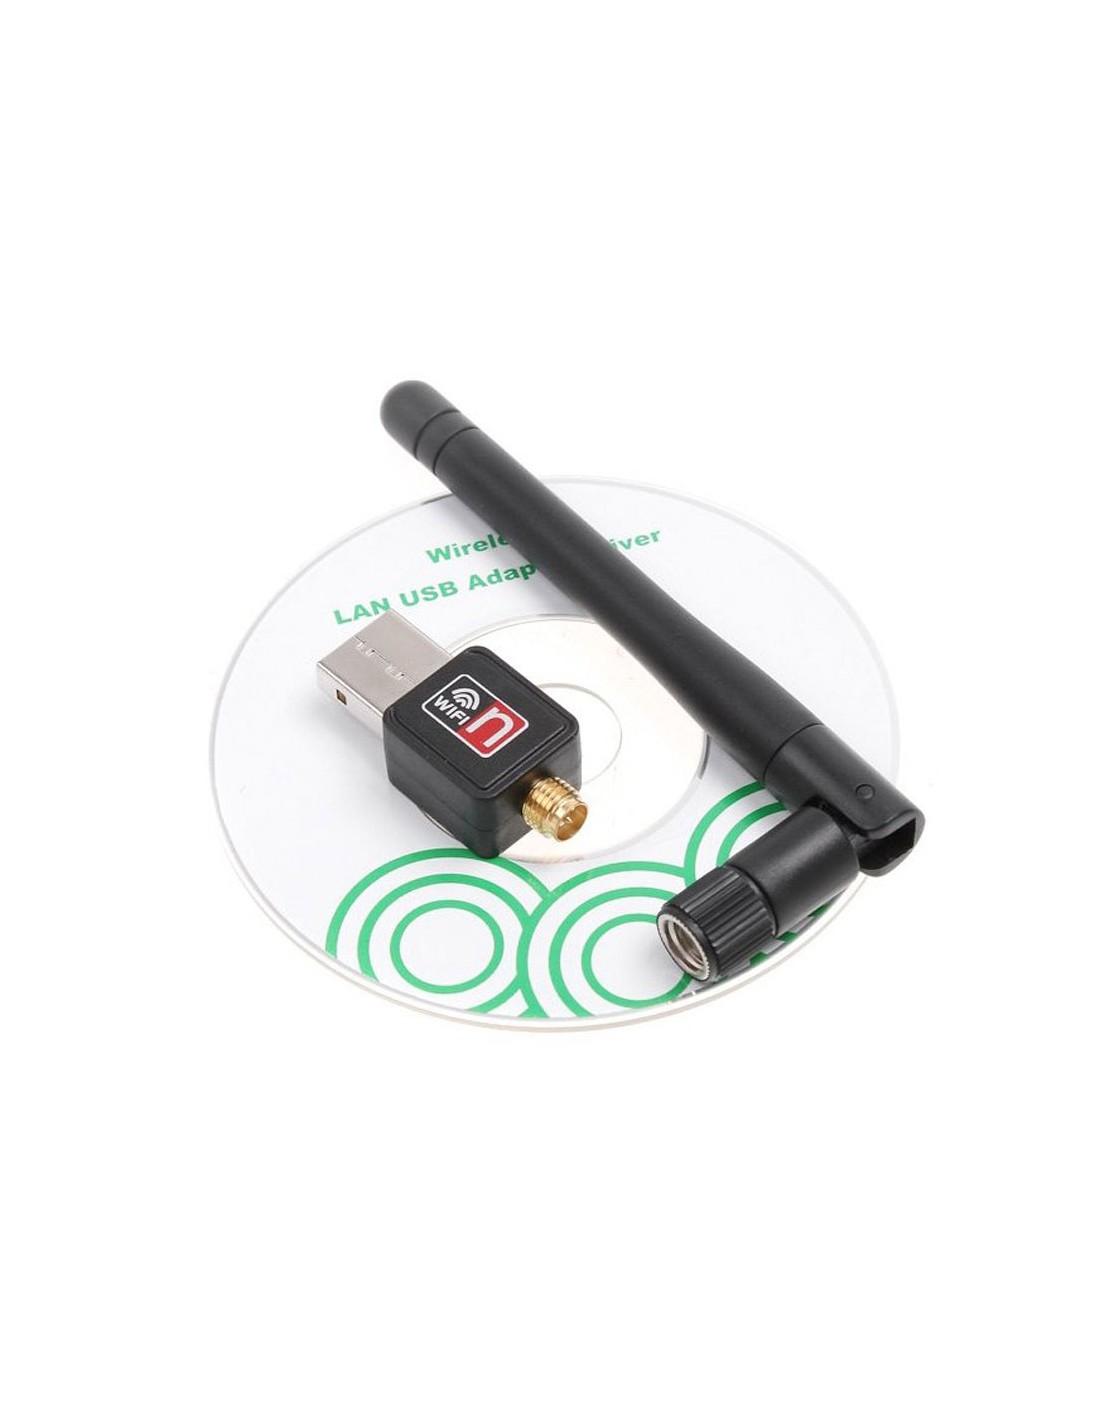 USB Wifi dongle with Antenna (pcDuino, Raspberry Pi, CubieBoard